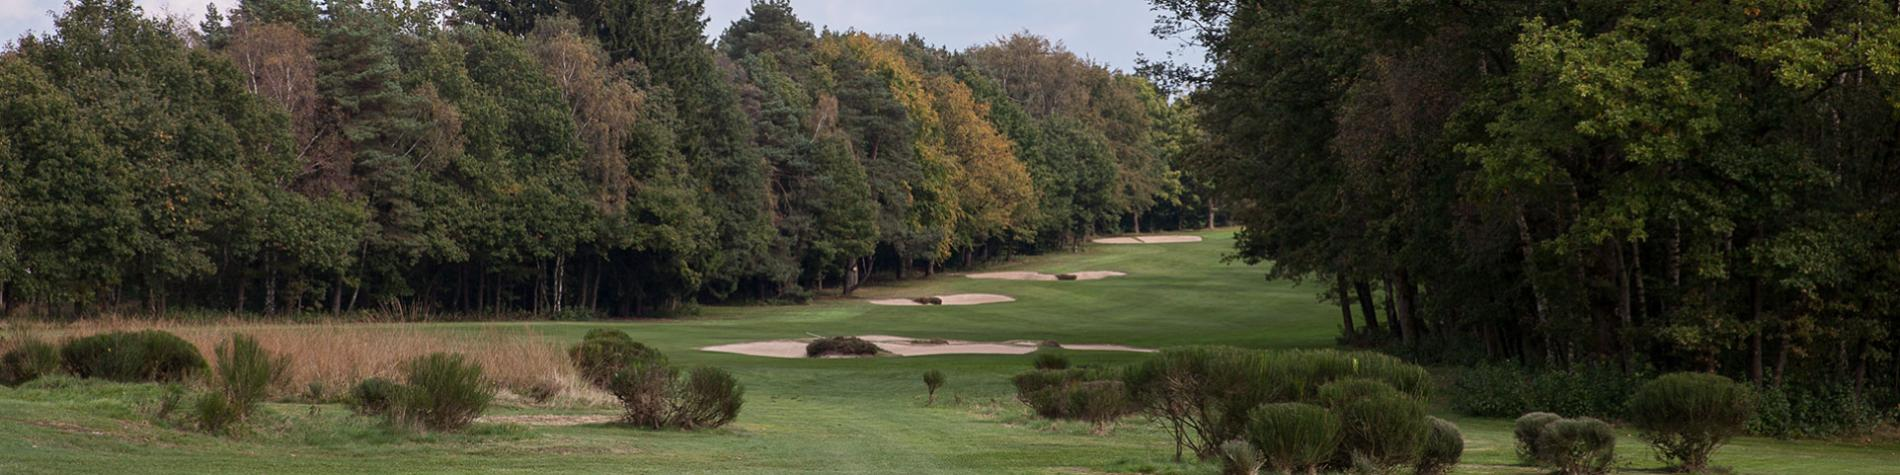 Royal - golf club - fagnes - Spa - Hole 13